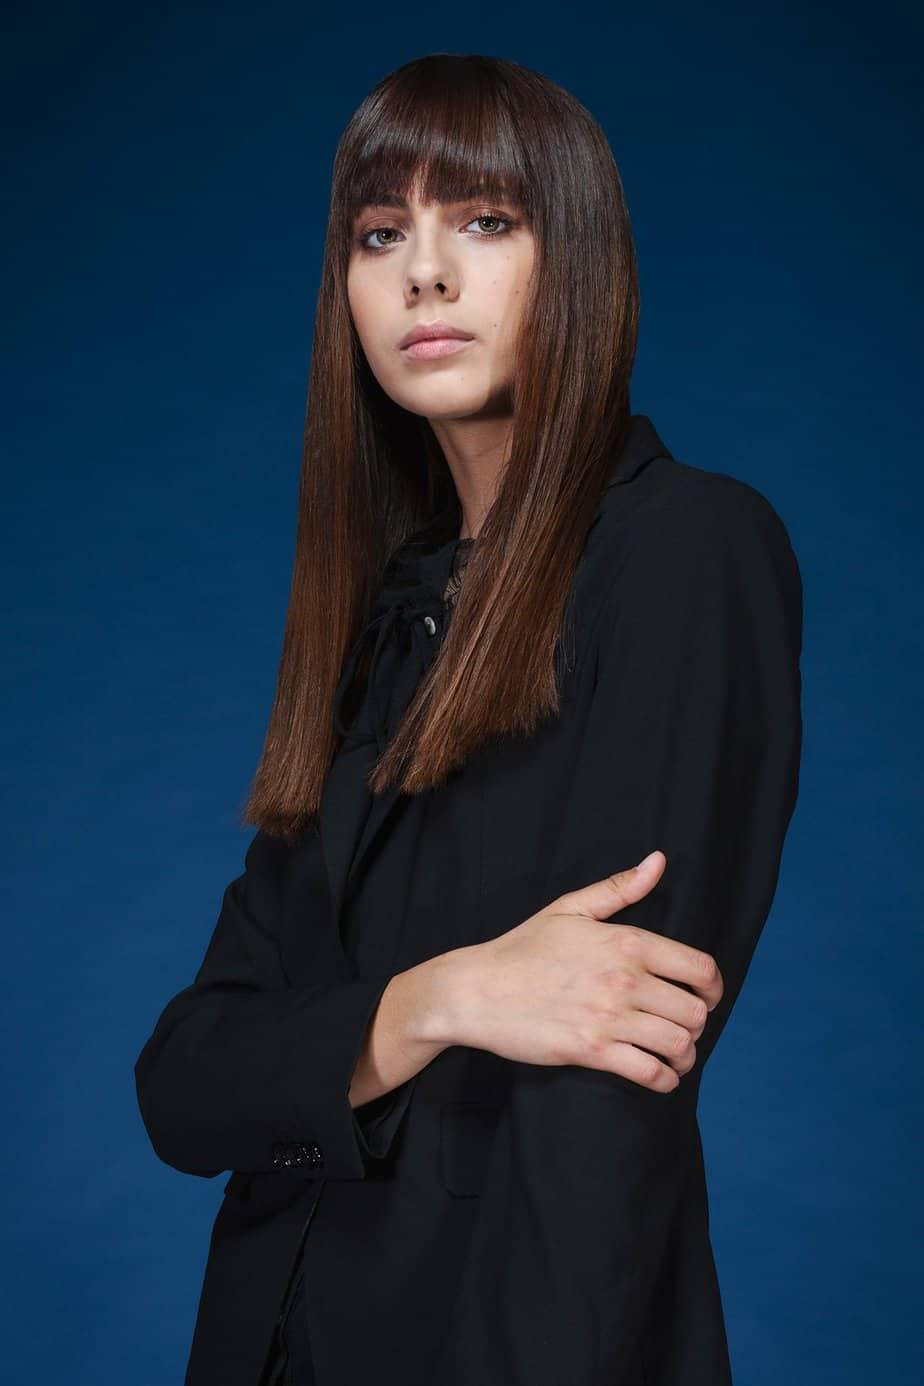 Blue_Milan_Model_fashionphotography_francescabandiera